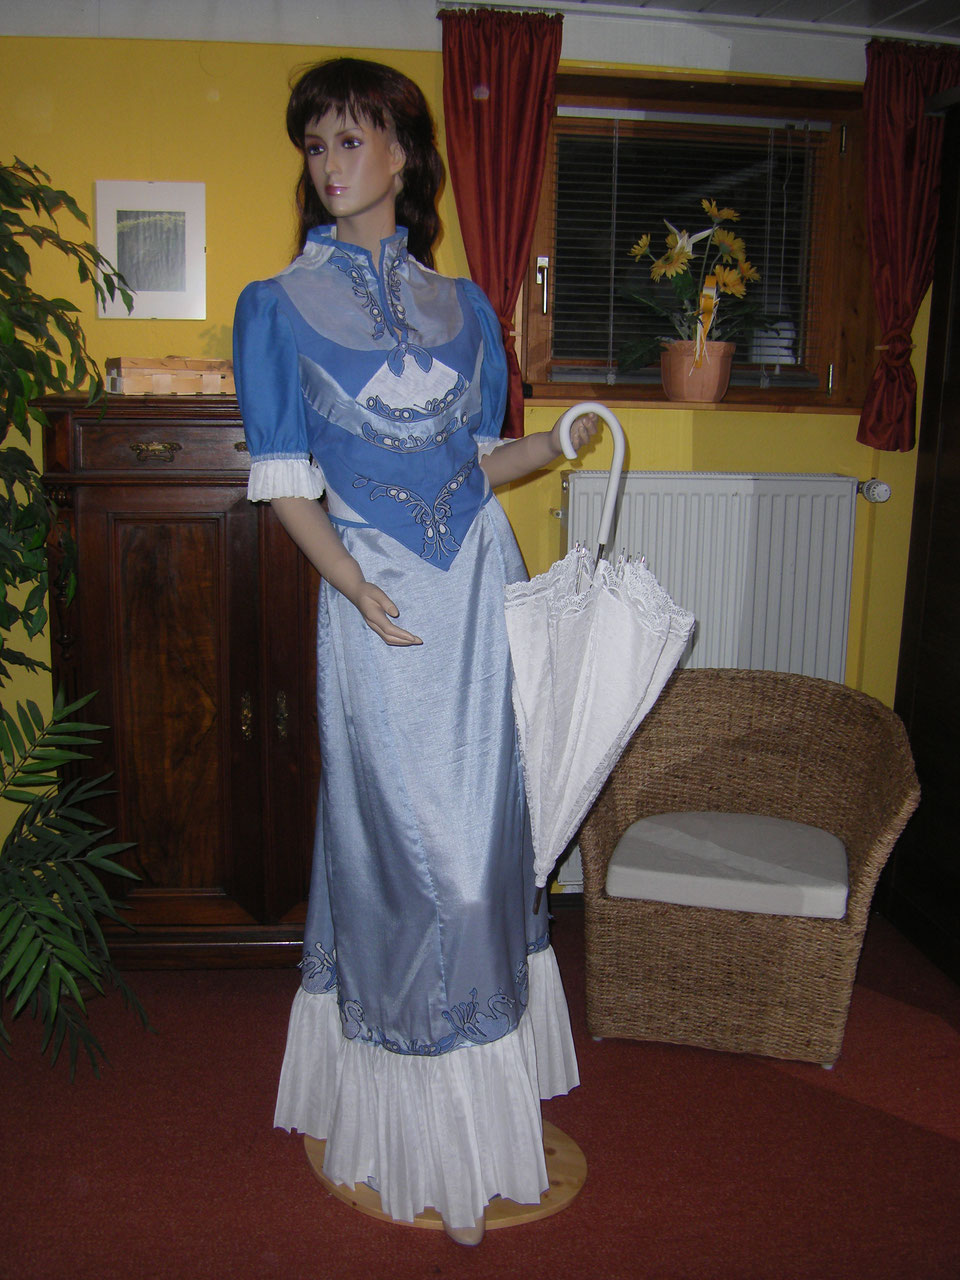 jahrhundertwende /jugendstil - history-modegeschichte in